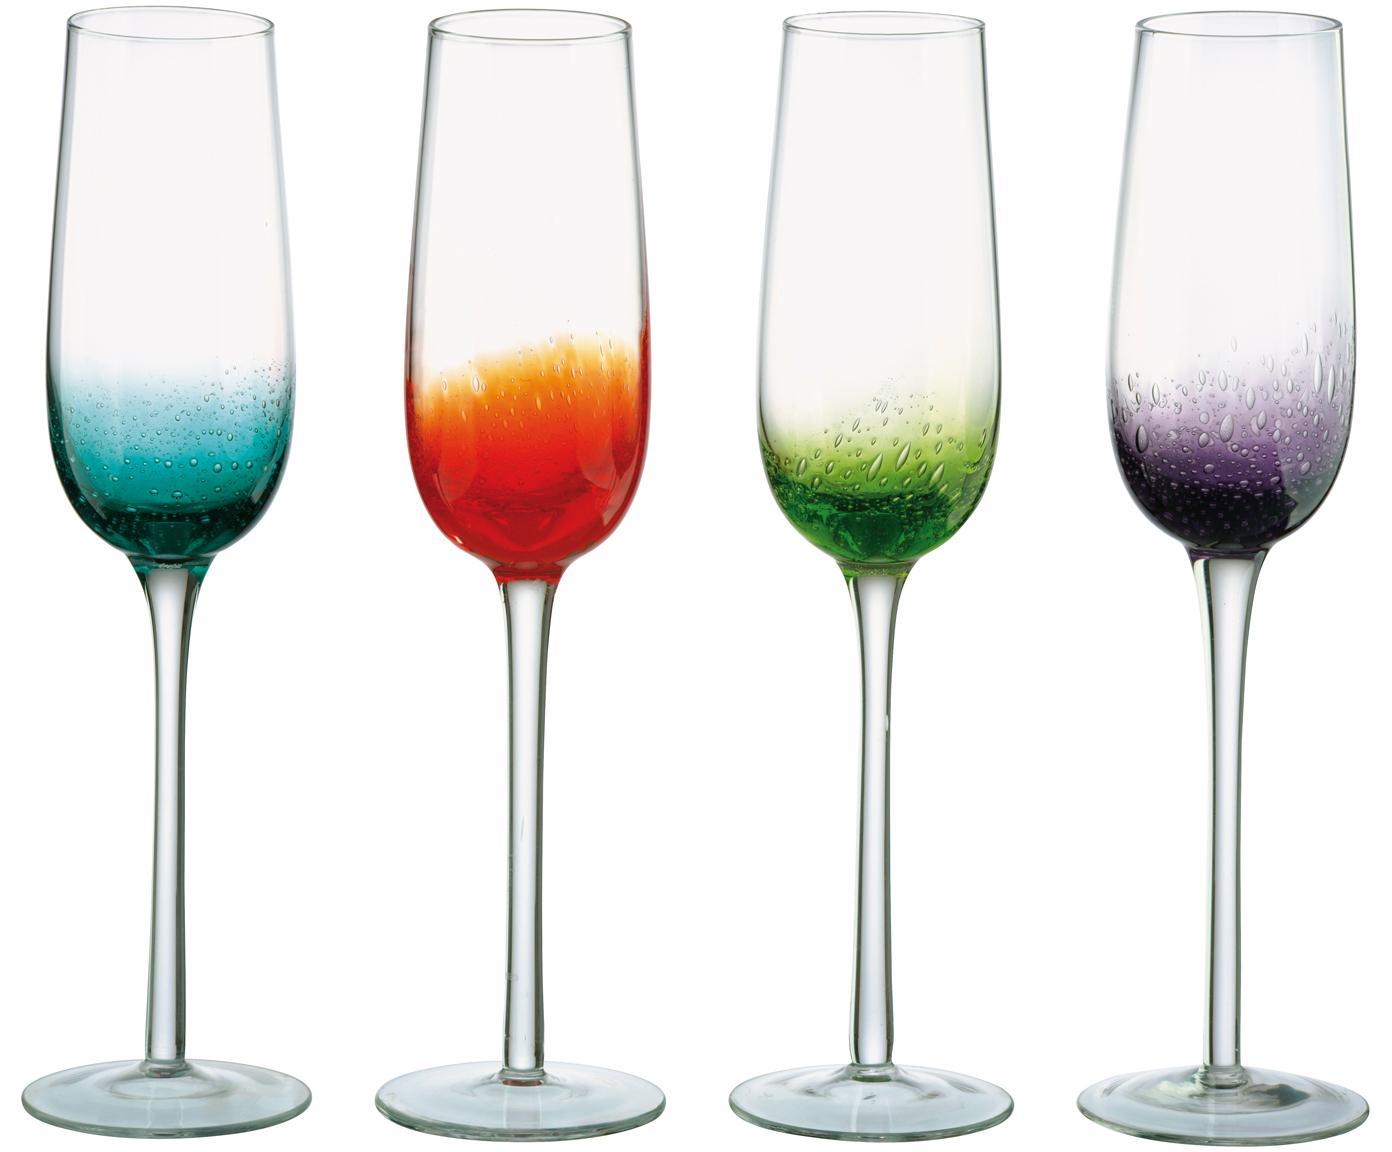 Copas flauta de champán de vidrio soplado Fizz, 4uds., Vidrio soplado artesanalmente, Transparente, multicolor, 250 ml